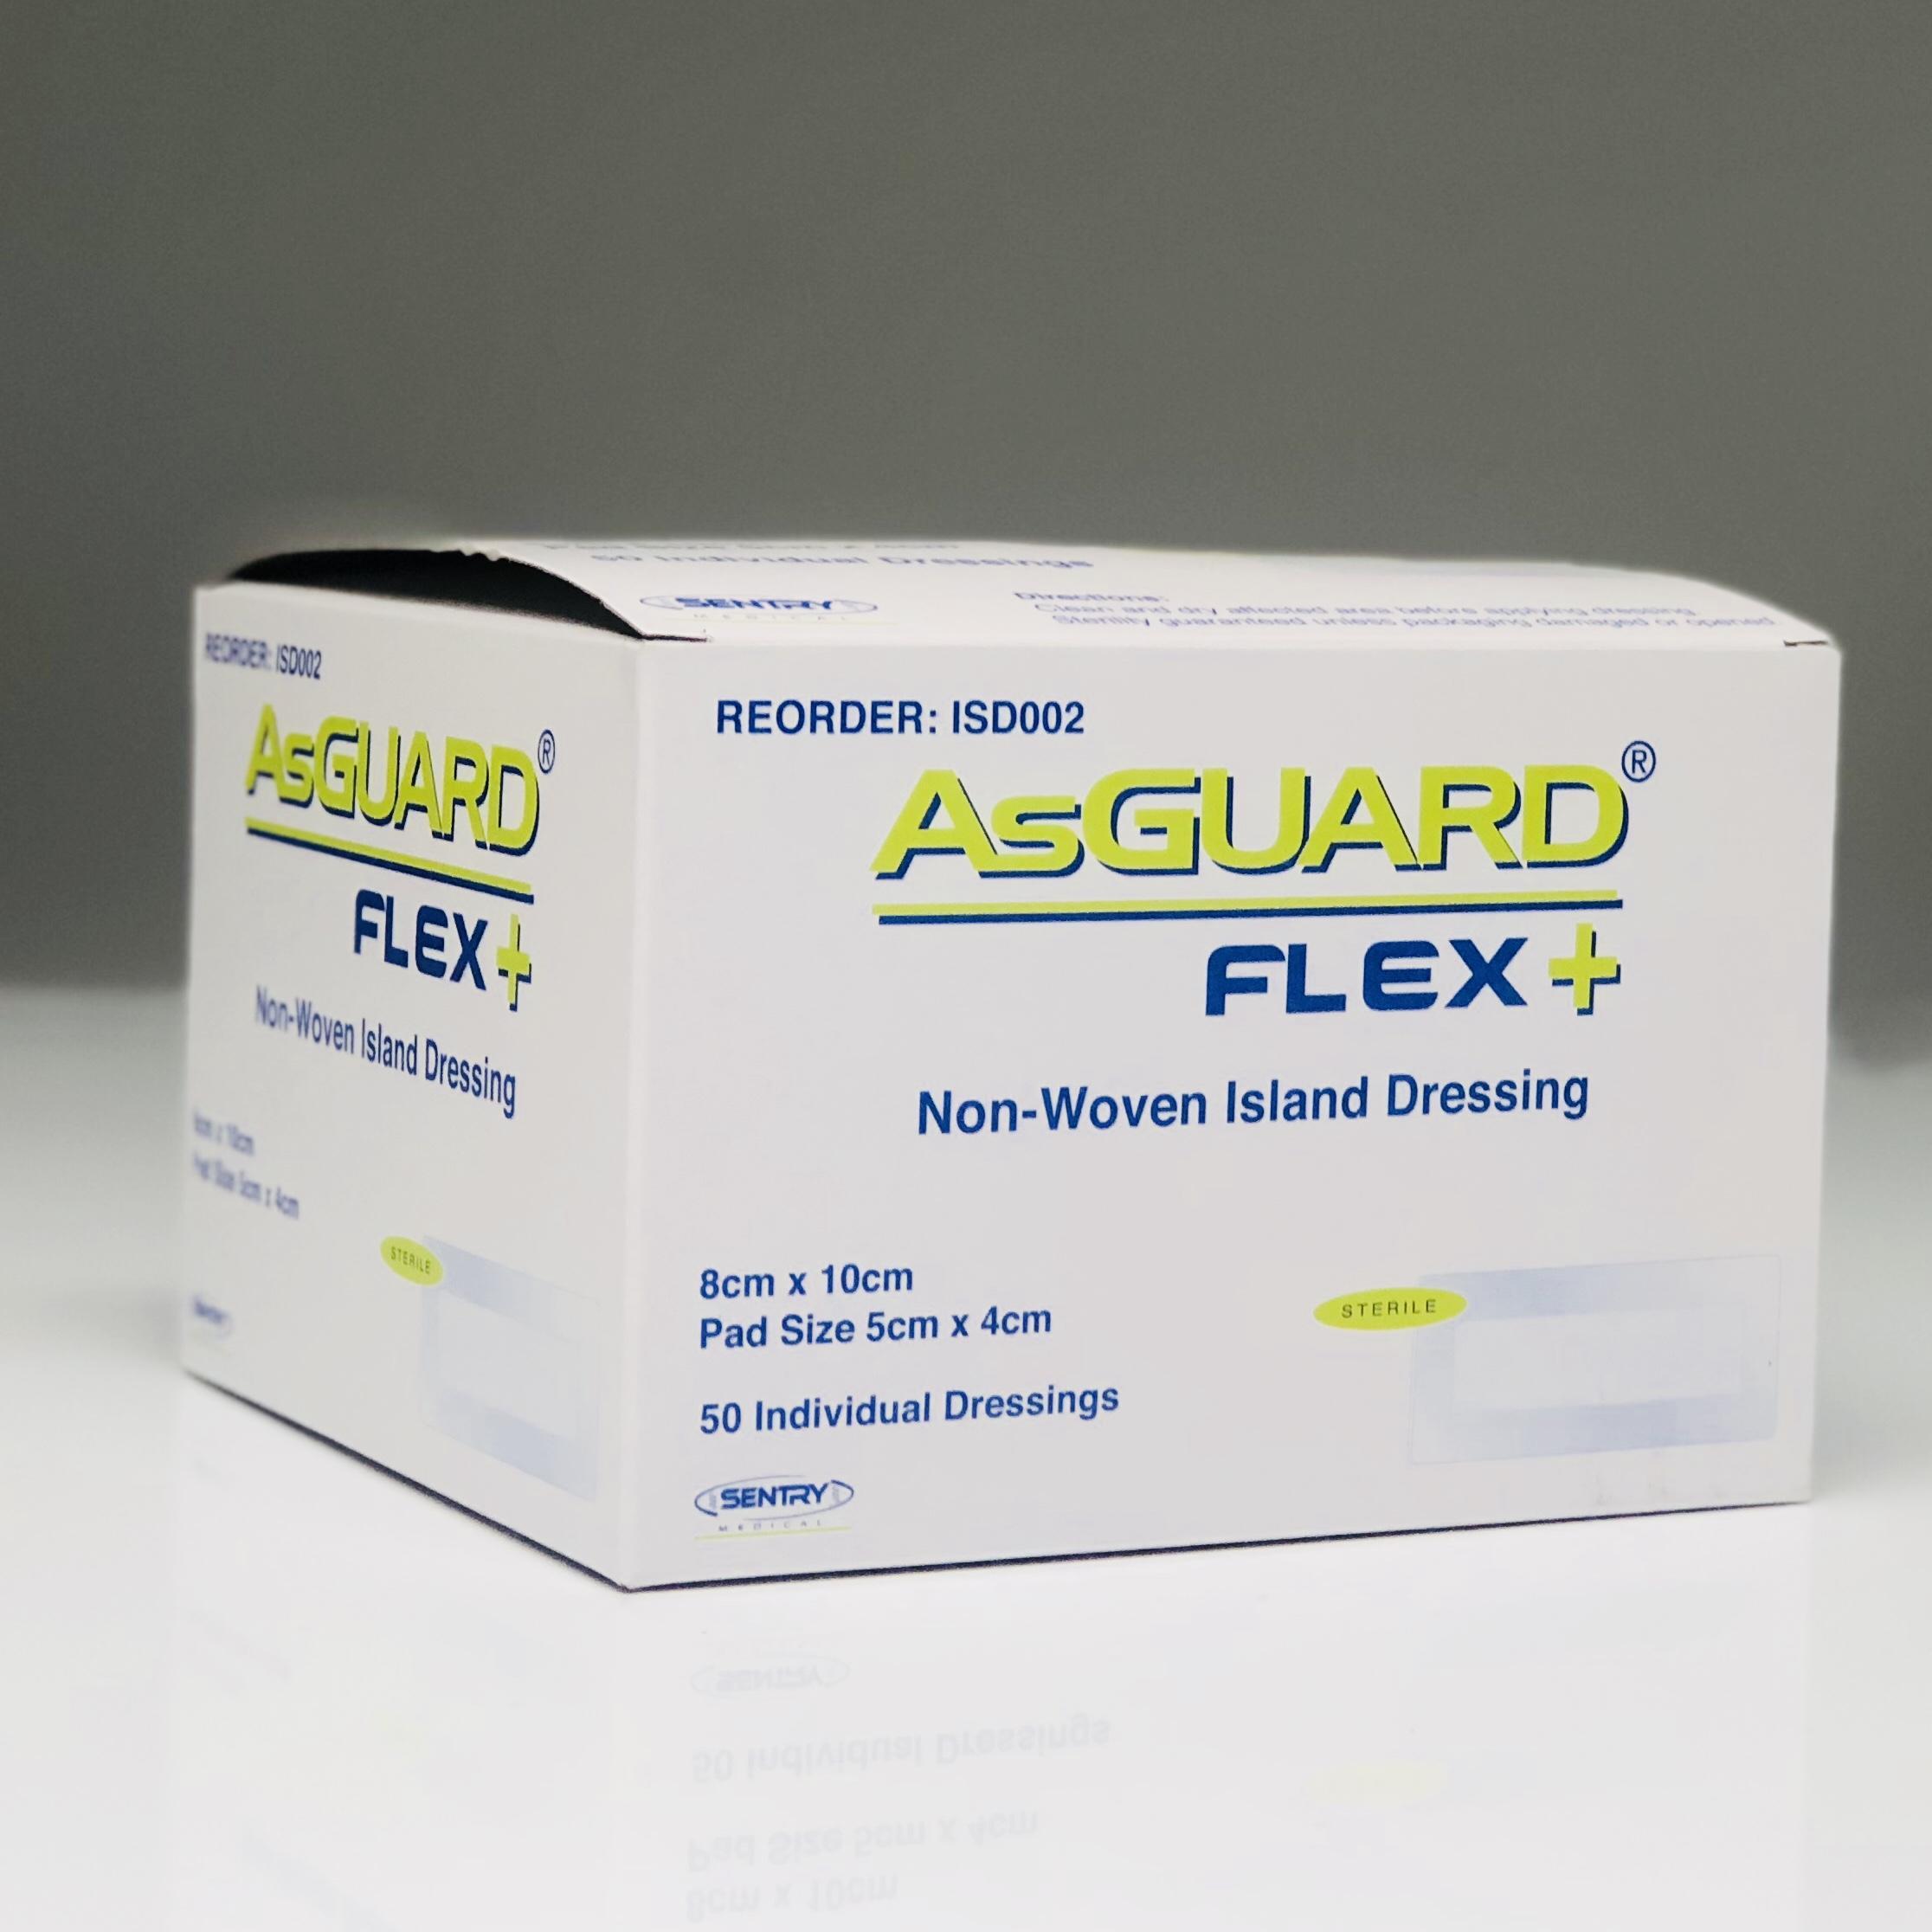 ASGUARD FLEX+ NON-WOVEN ISLAND DRESSING 8CMx10CM, BOX 50